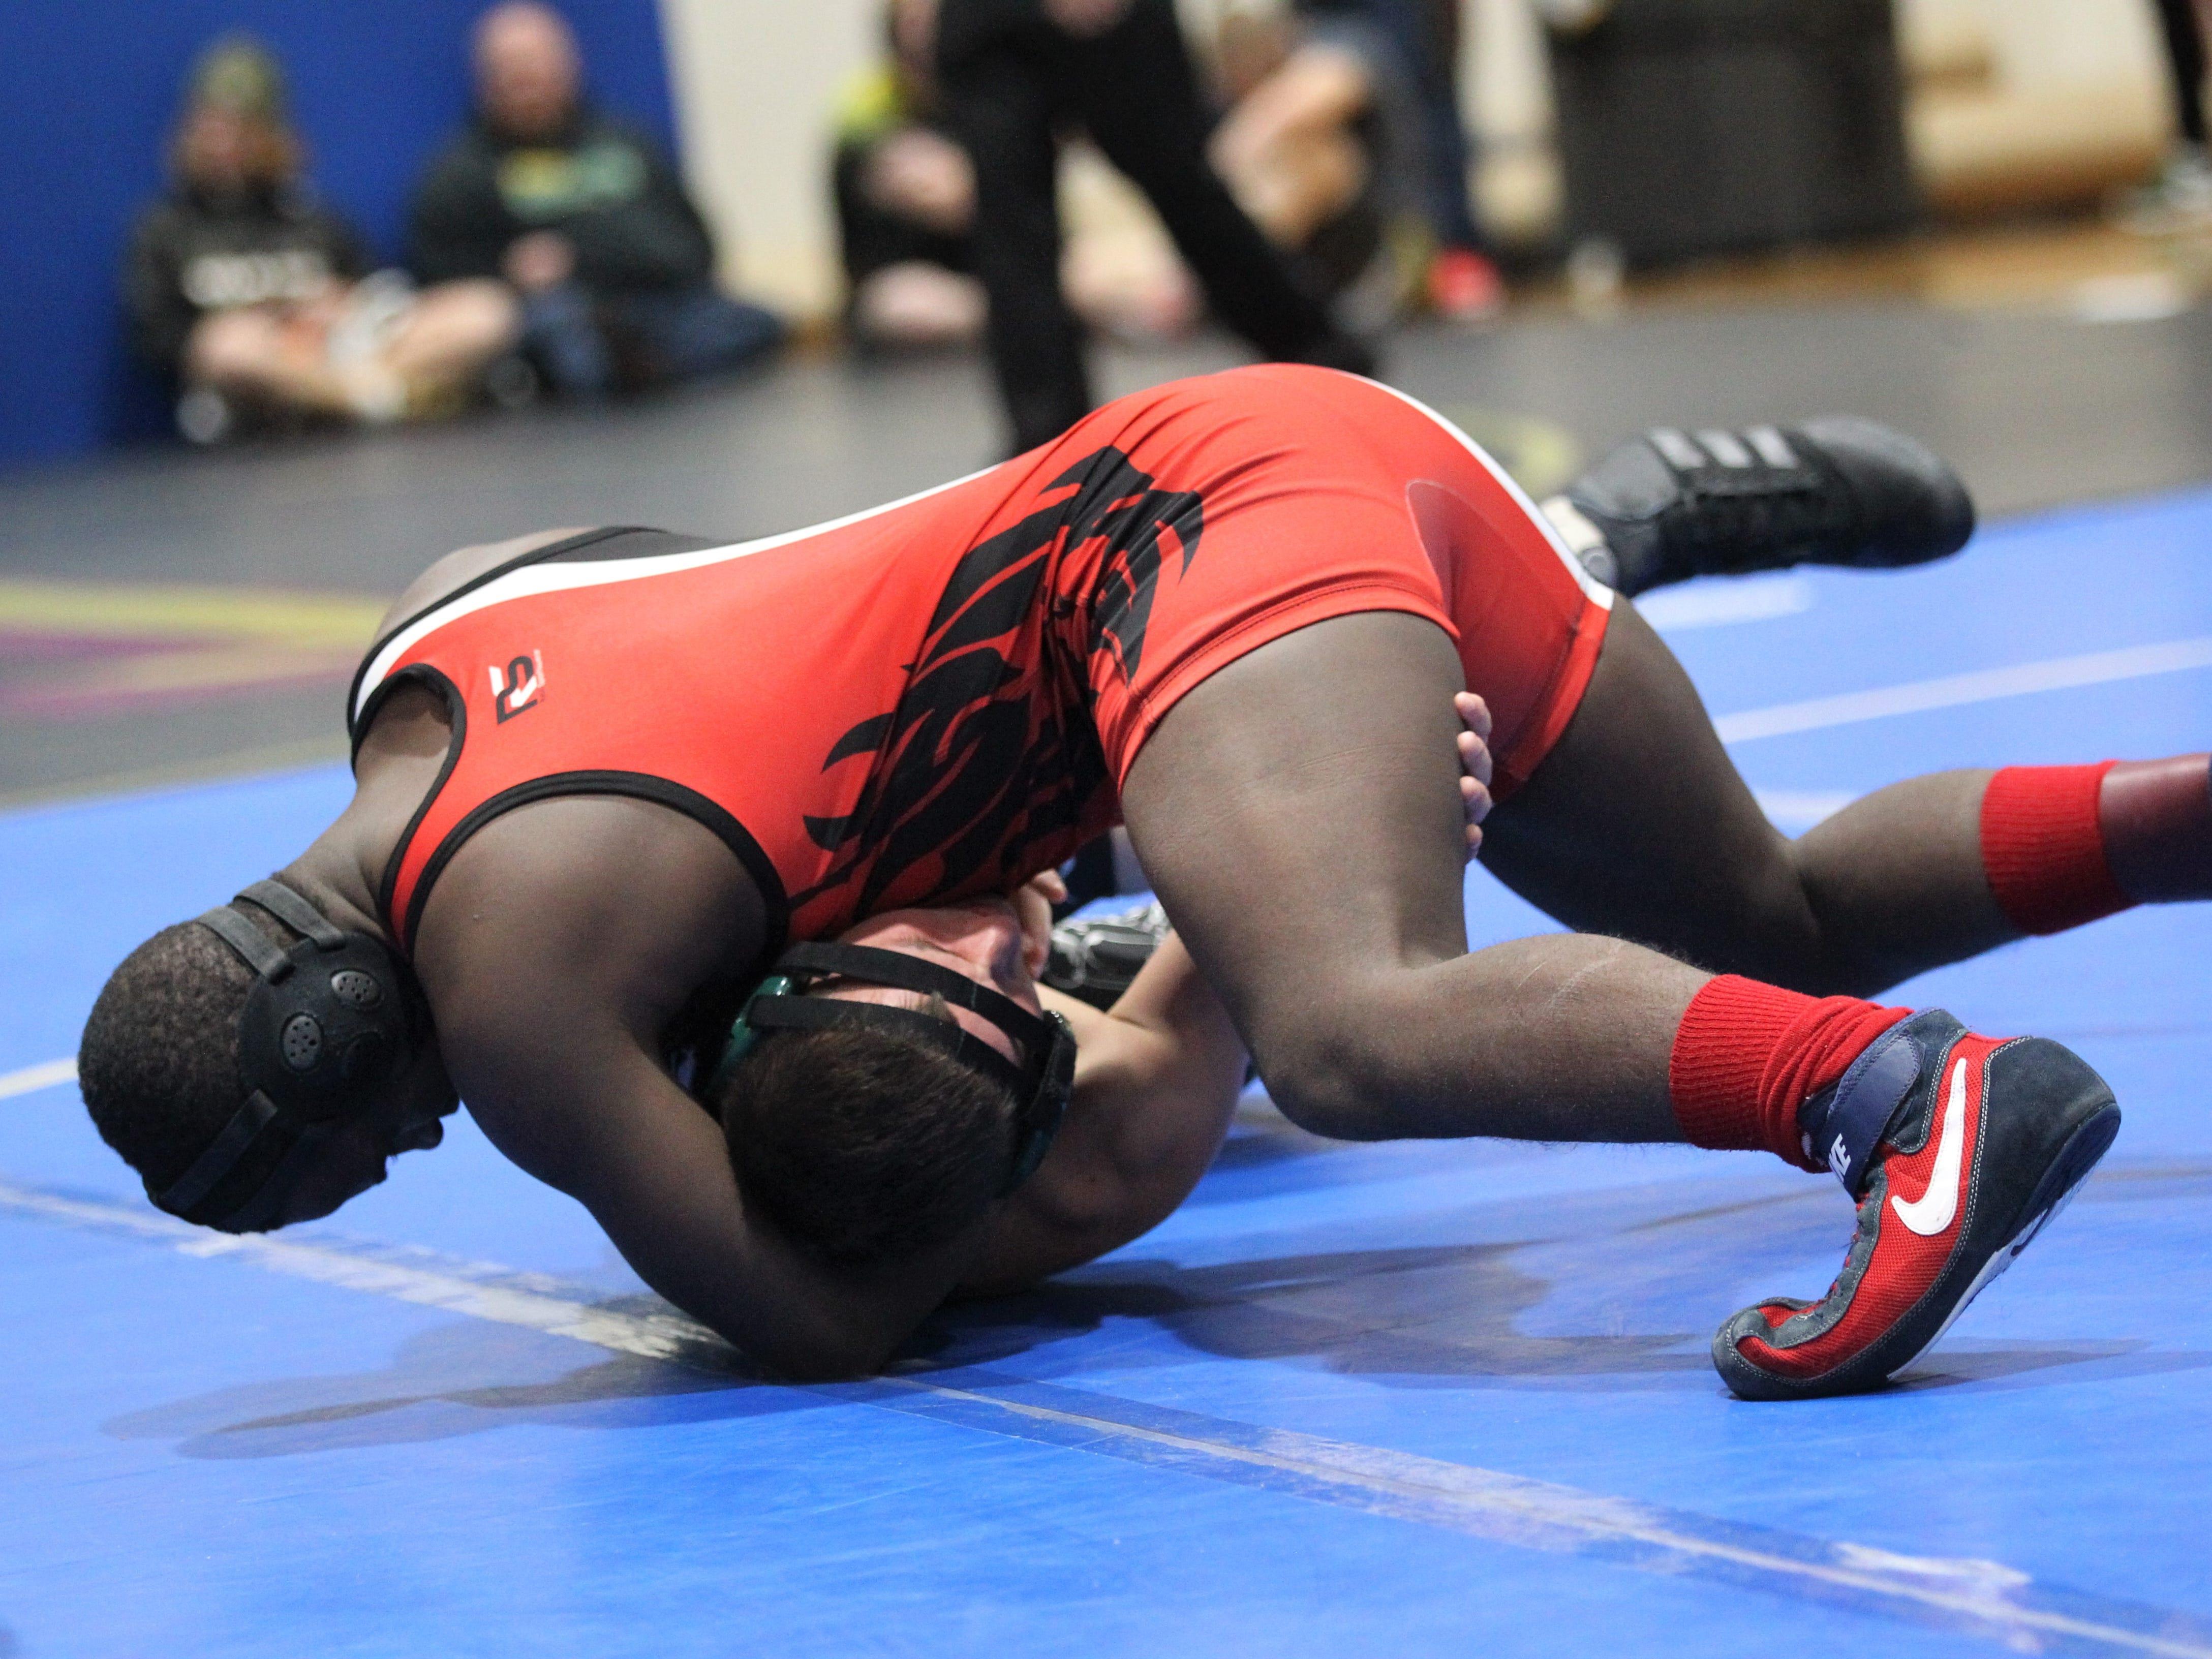 Leon's Jaquenez Madison wrestles at the Cam Brown Seminole Classic wrestling tournament at Florida High on Dec. 7-8, 2018.